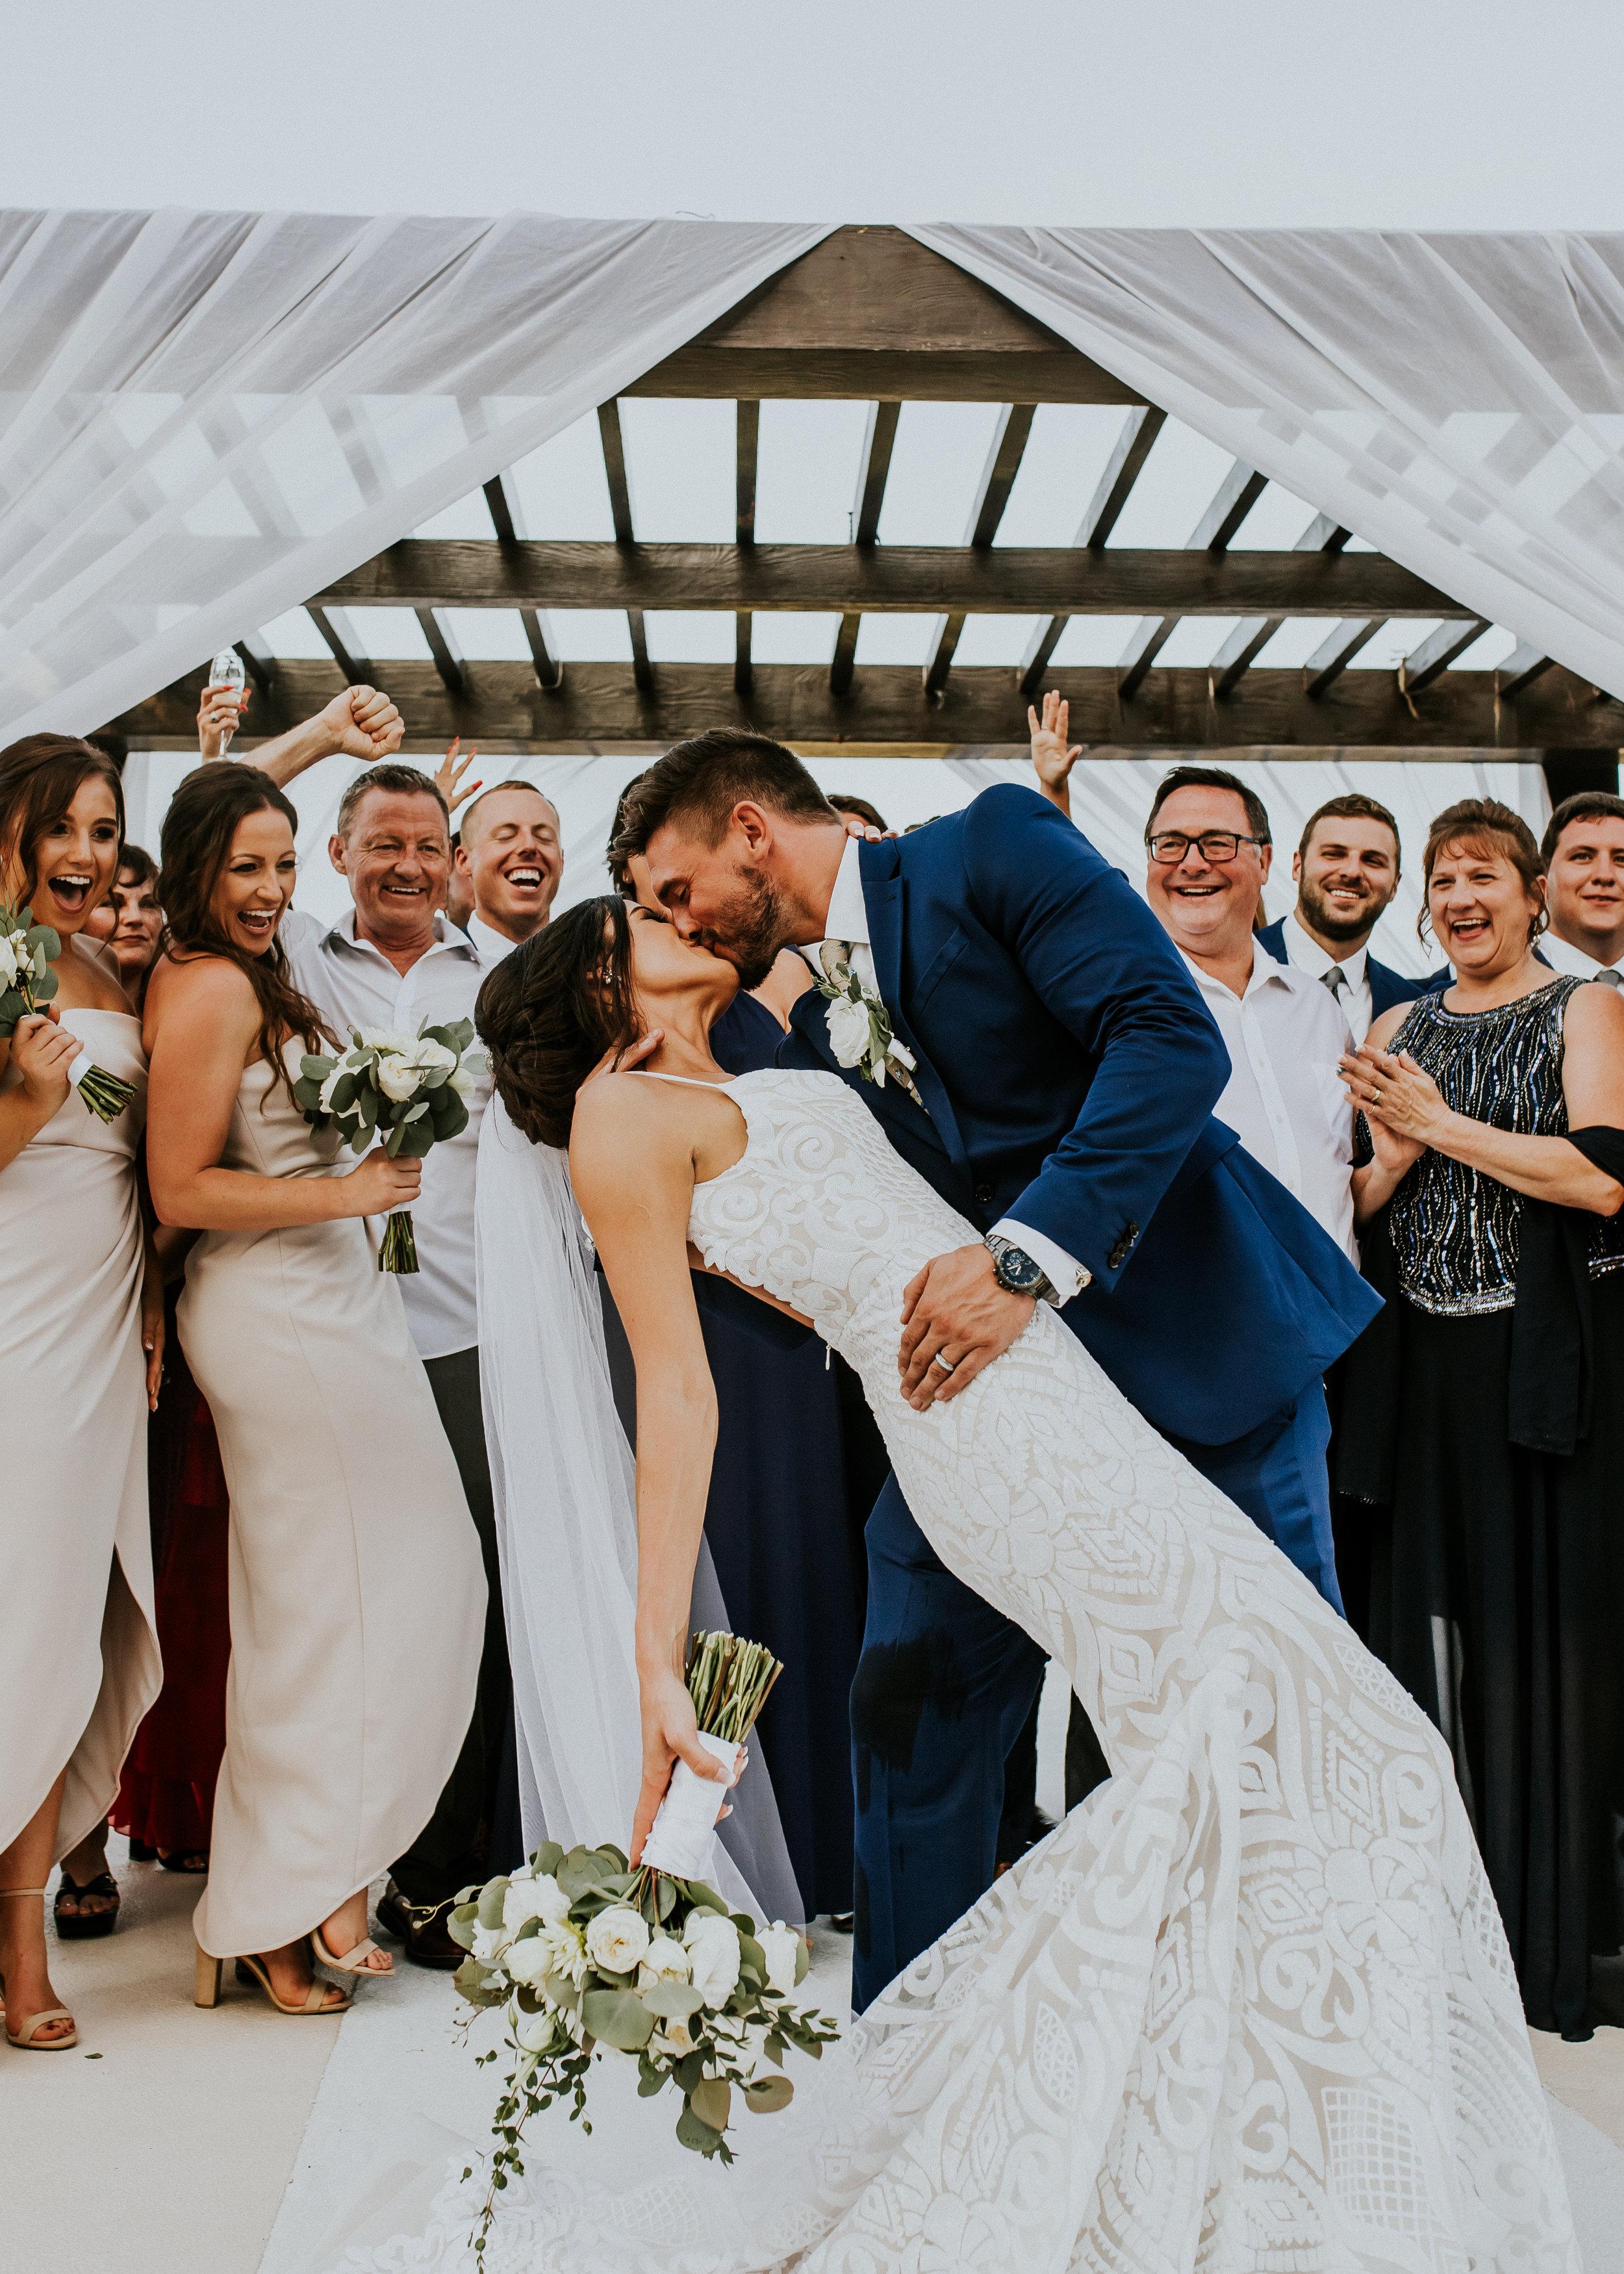 WeddingDay-323.jpg